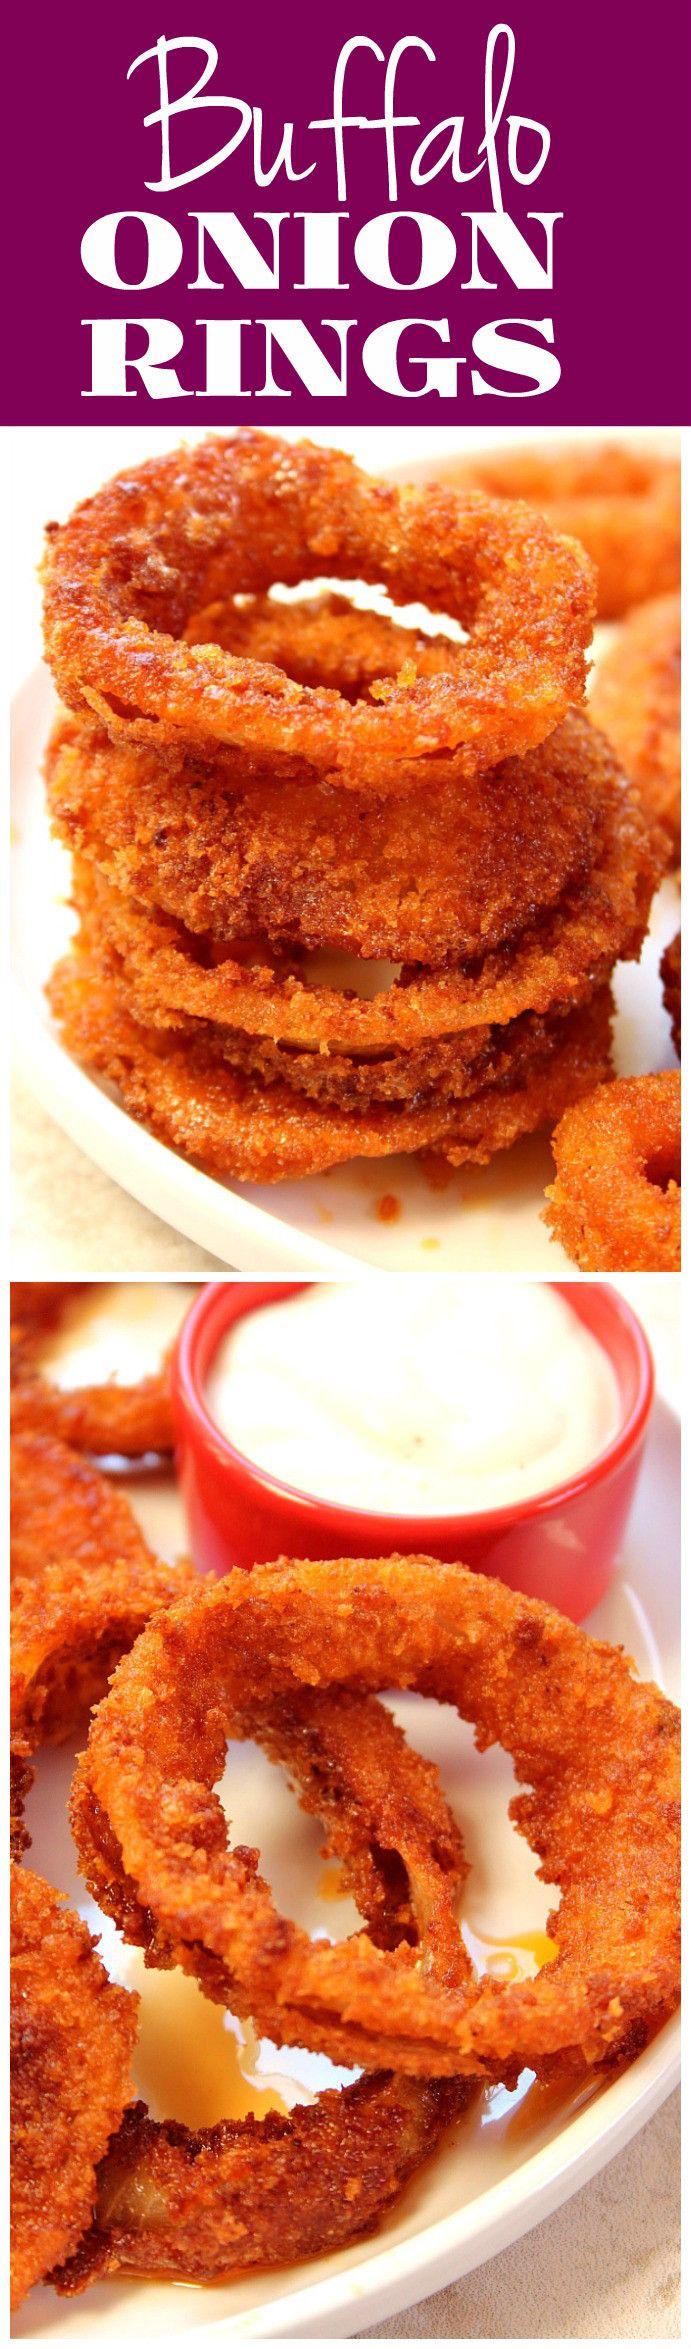 Buffalo Onion Rings Recipe